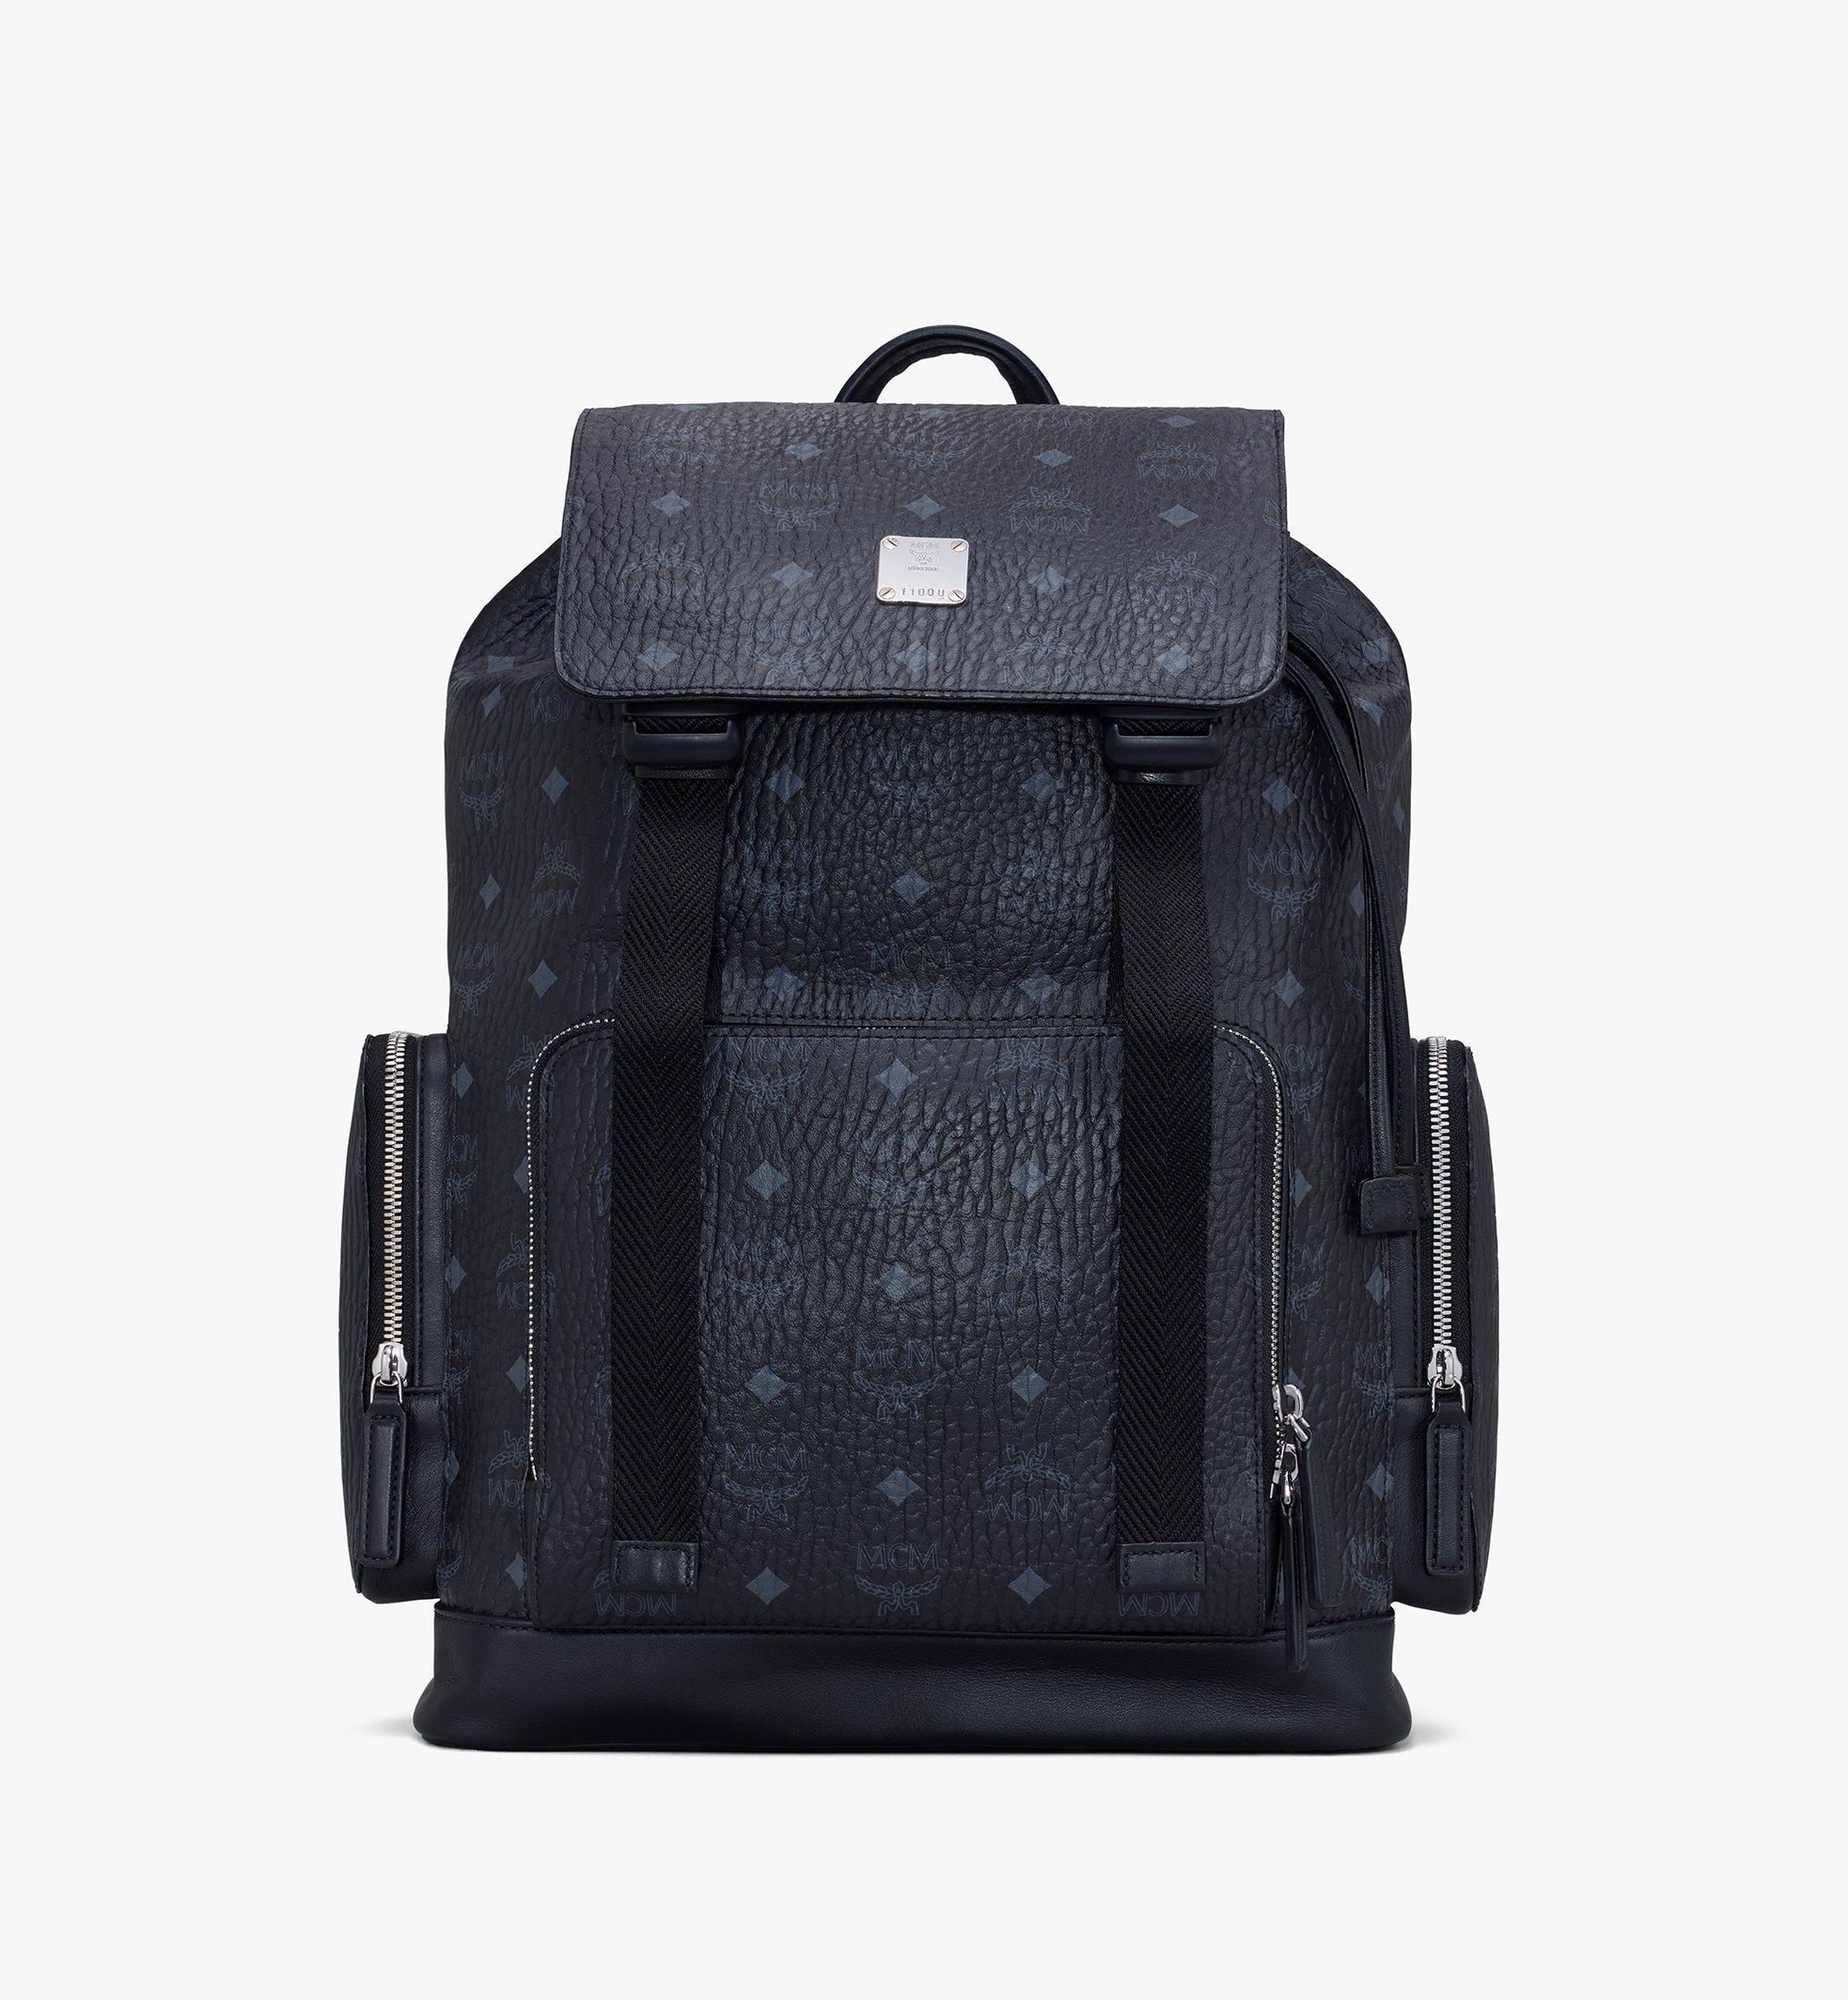 MCM Brandenburg Backpack in Visetos Black MMKASBG04BK001 Alternate View 1